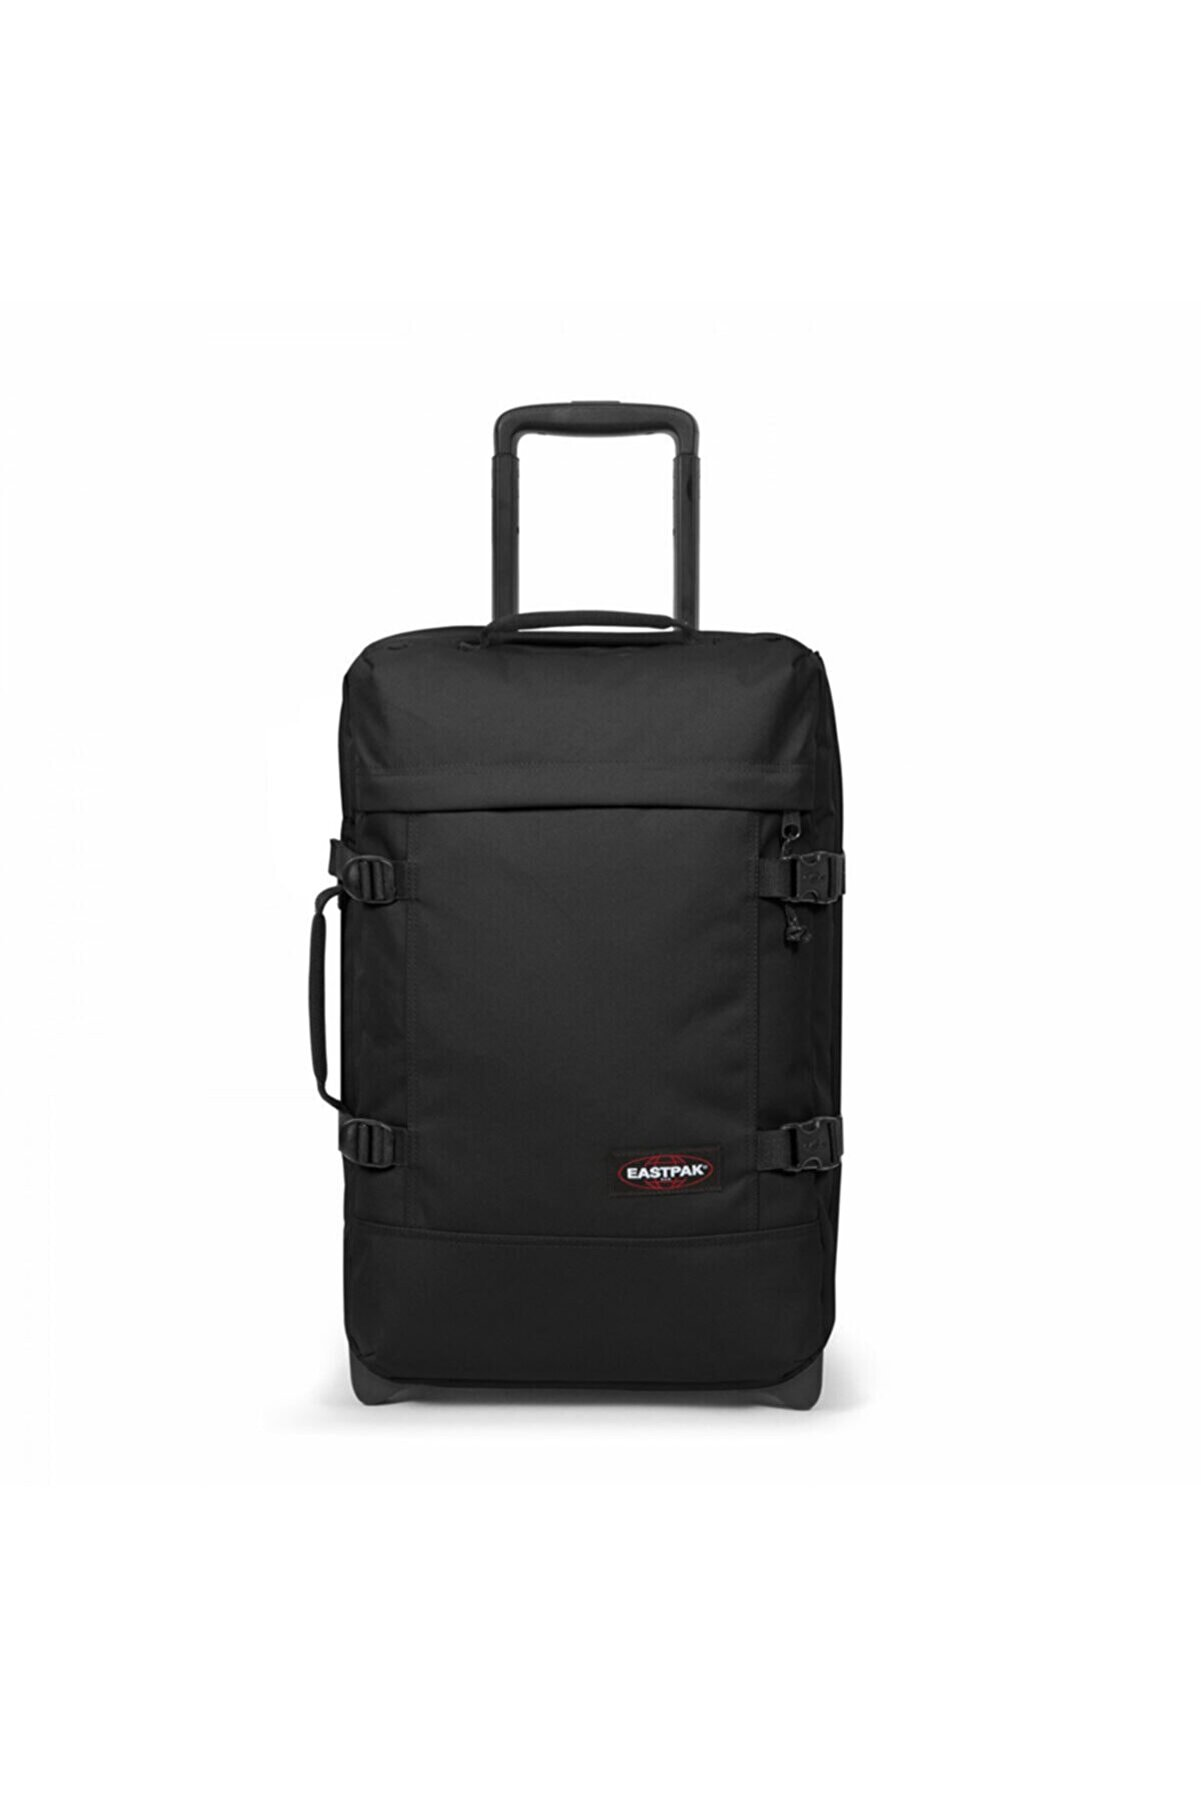 Eastpak Unisex Siyah Valiz & Bavul EK61L008